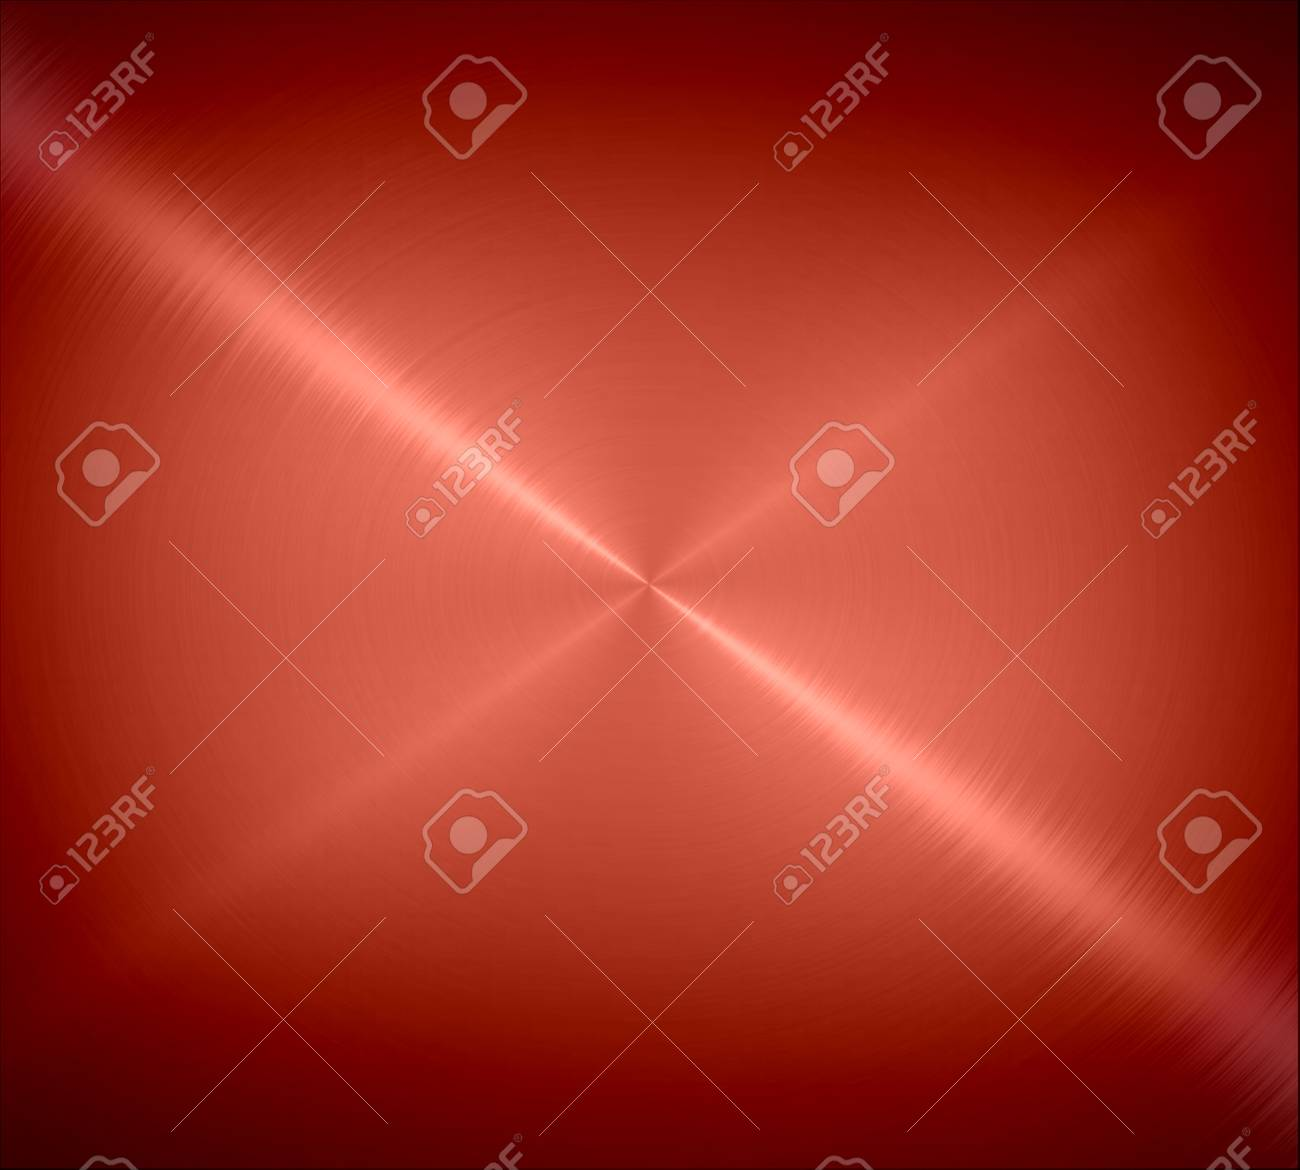 Metallic Stainless Steel Metal Texture Background Stock Photo - 15922310